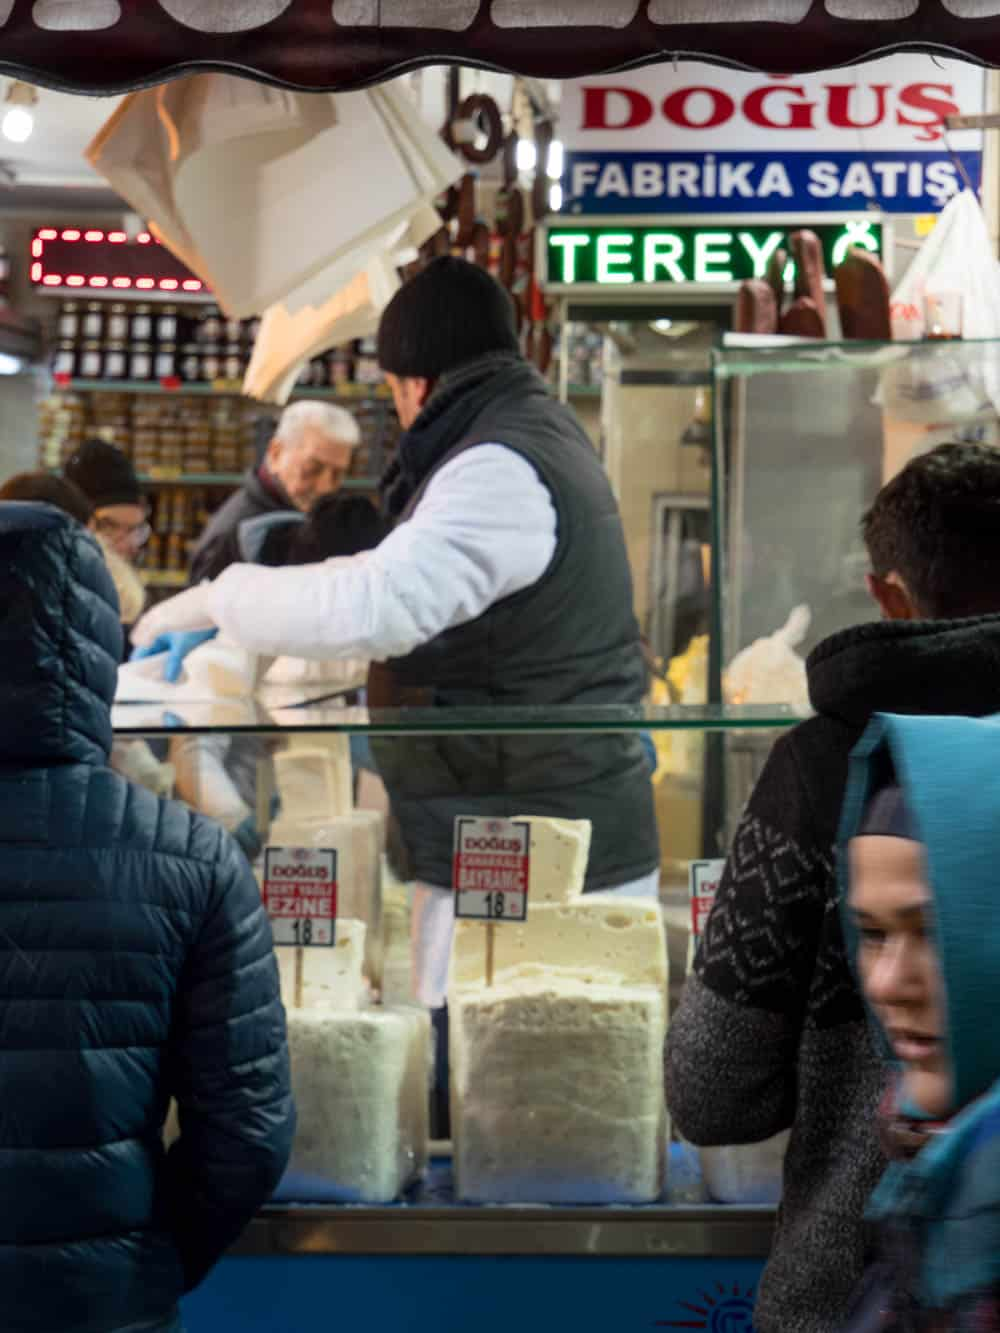 Osteforhandler ved kryddermarkedet i Istanbul (Misir carsisi) / Et kjøkken i Istanbul